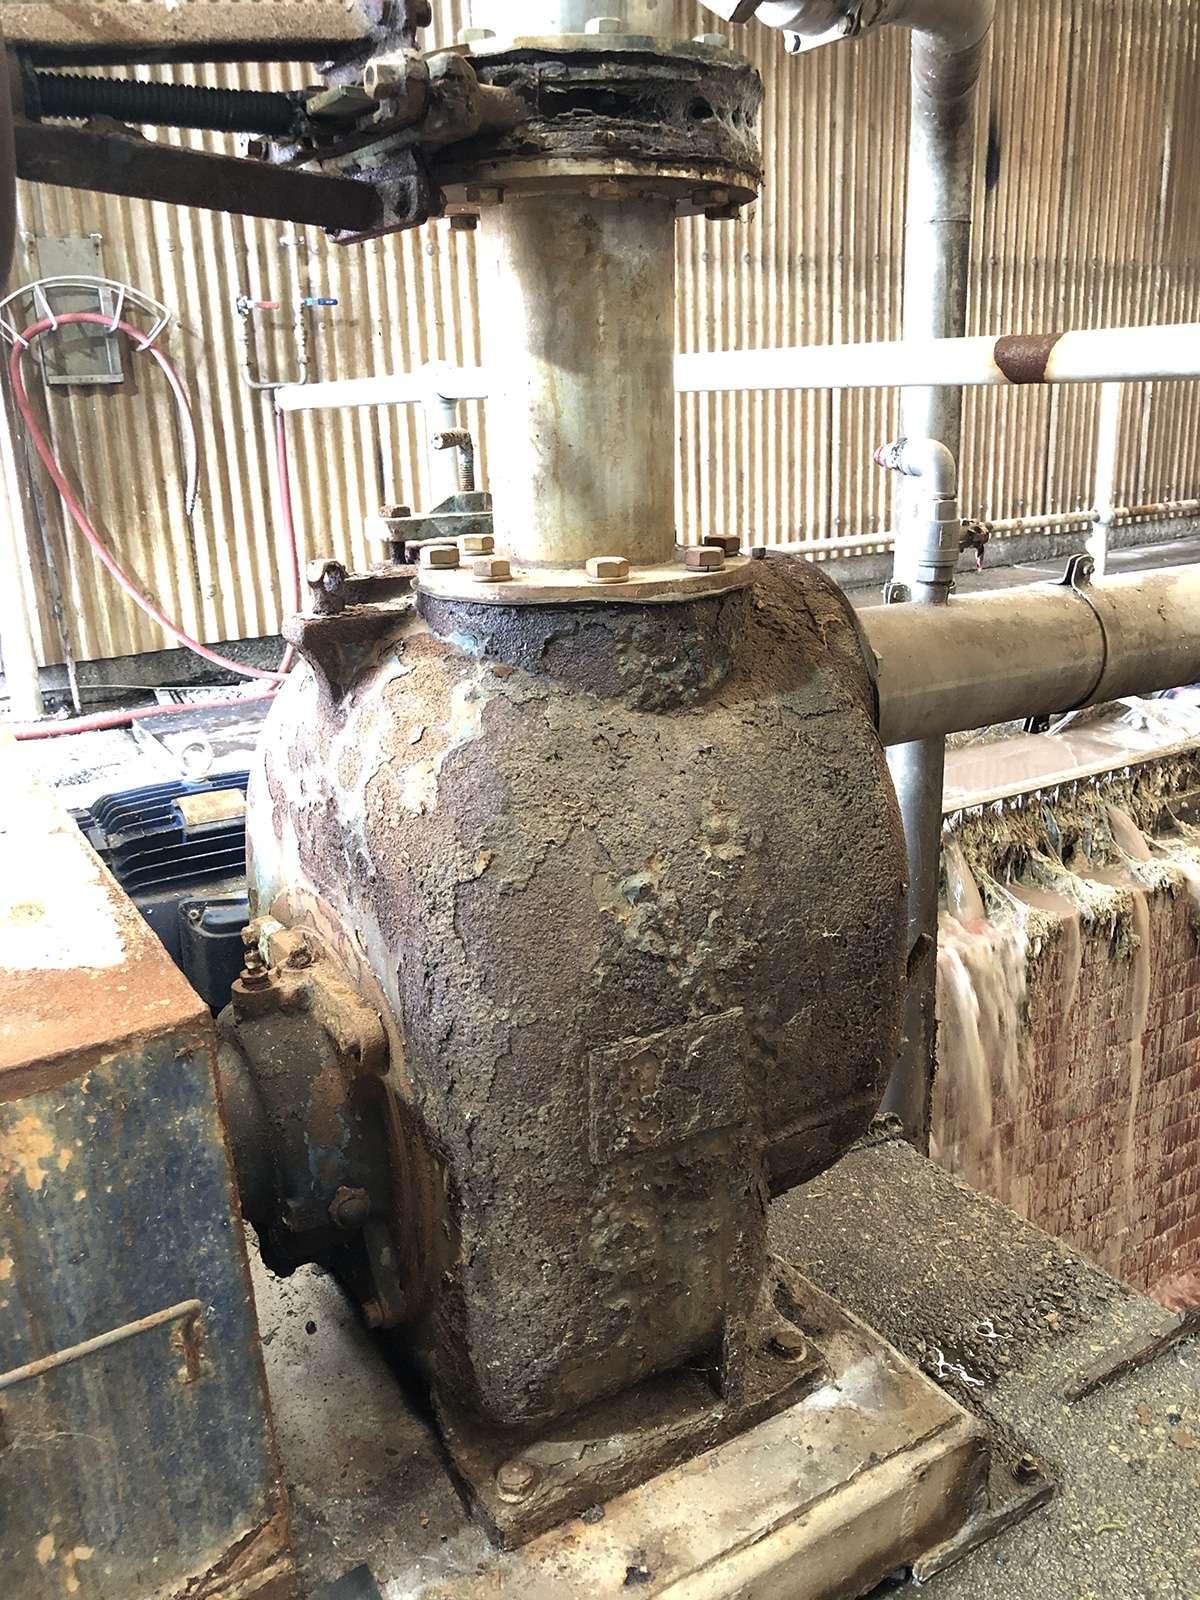 wastewater-abattoir-herd-pumps-like-swarznegger